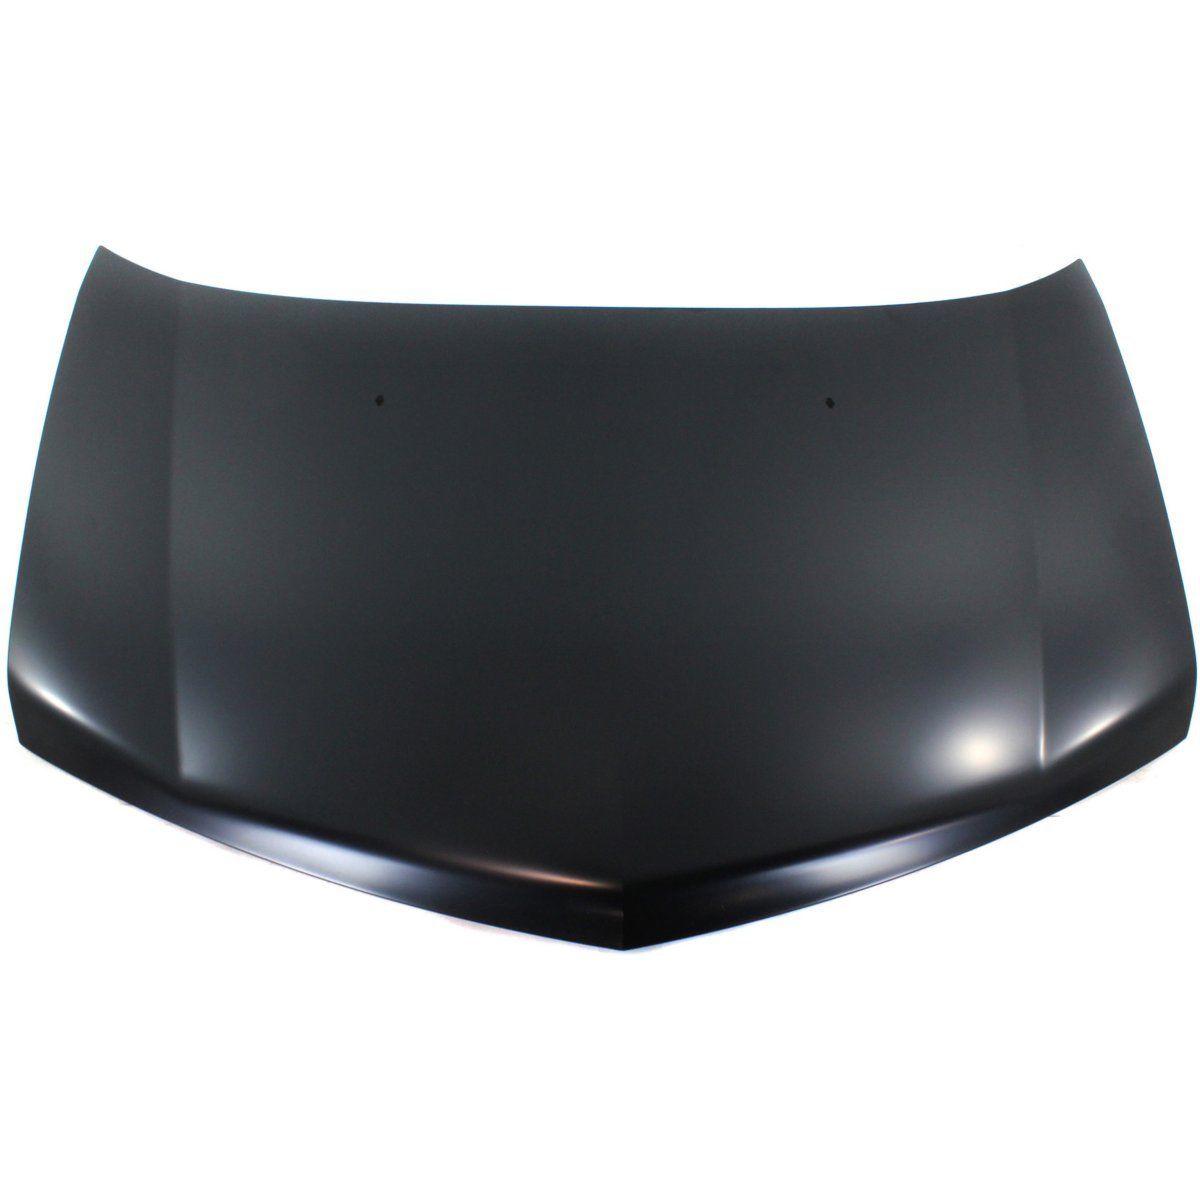 Hood For 2007-2013 Acura MDX Primed Steel